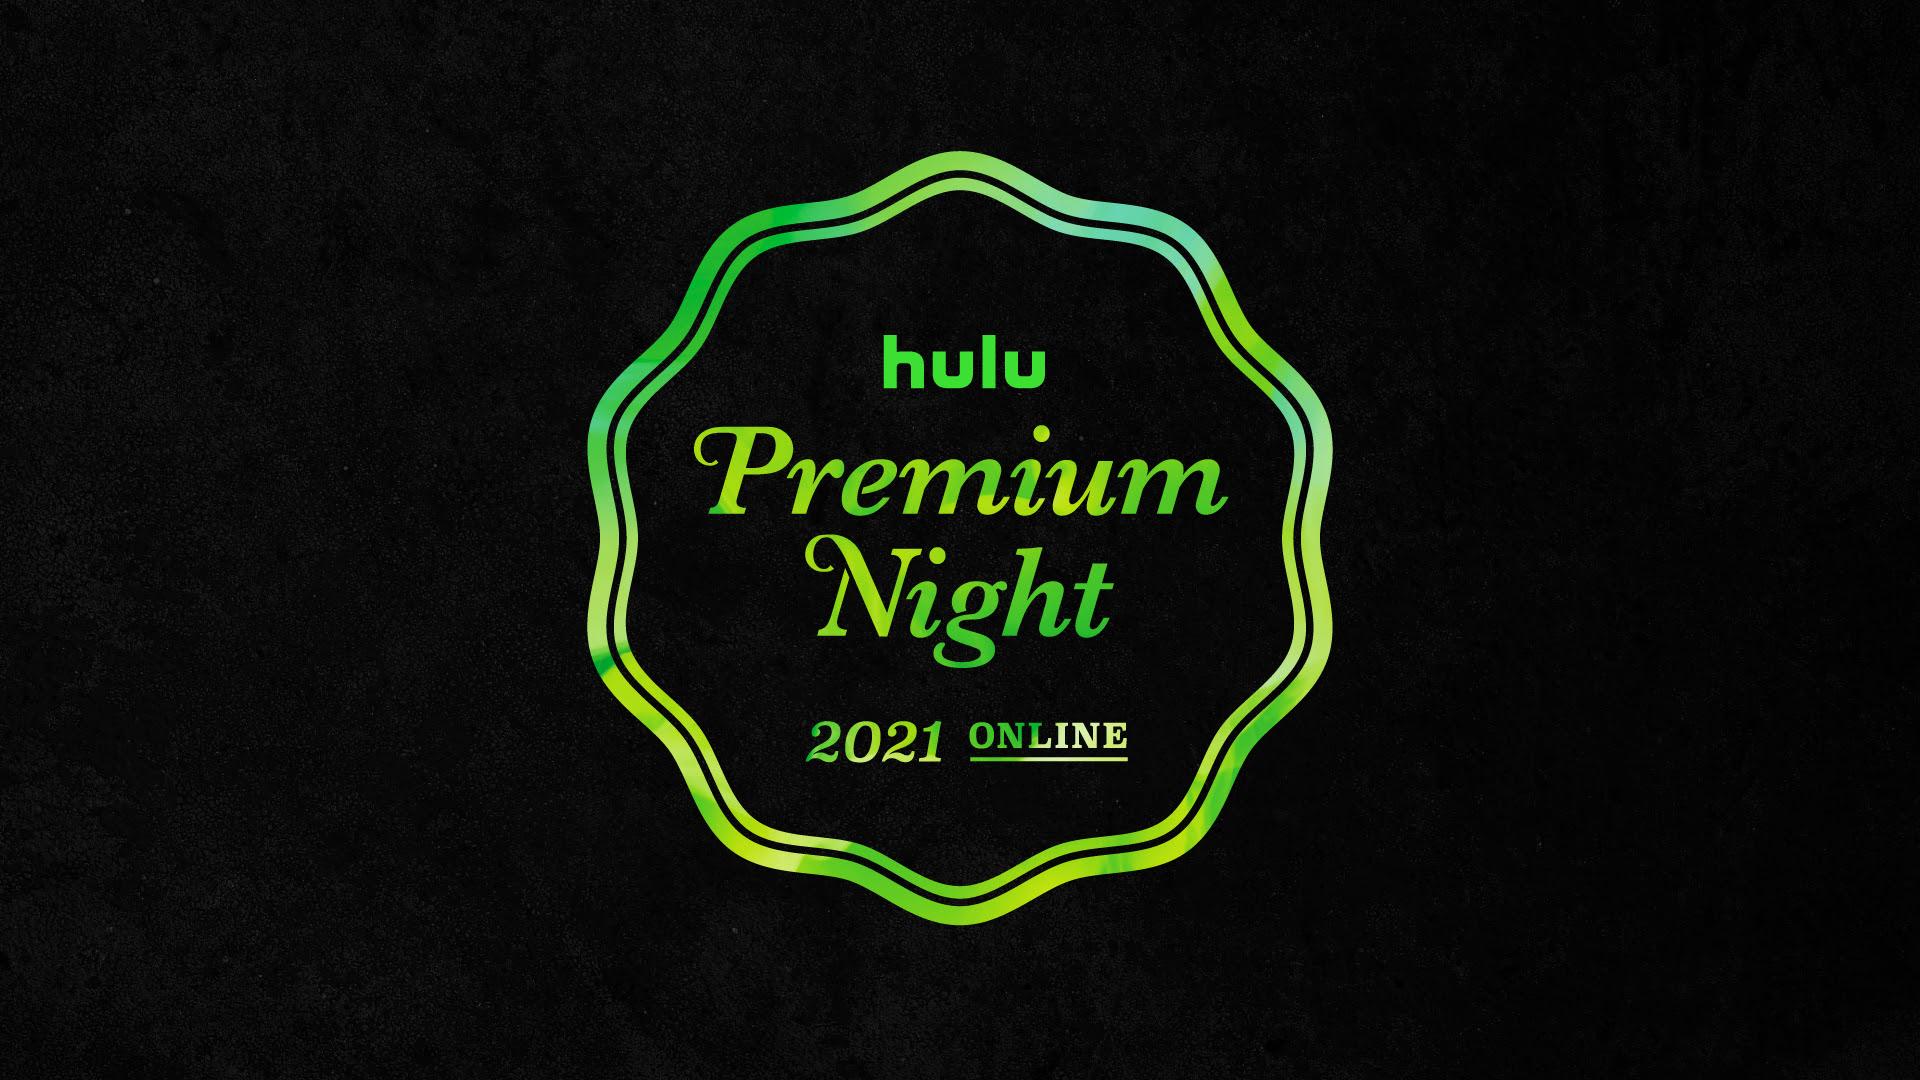 hulu Premium Night 2021フーループレミアムナイト開催決定!